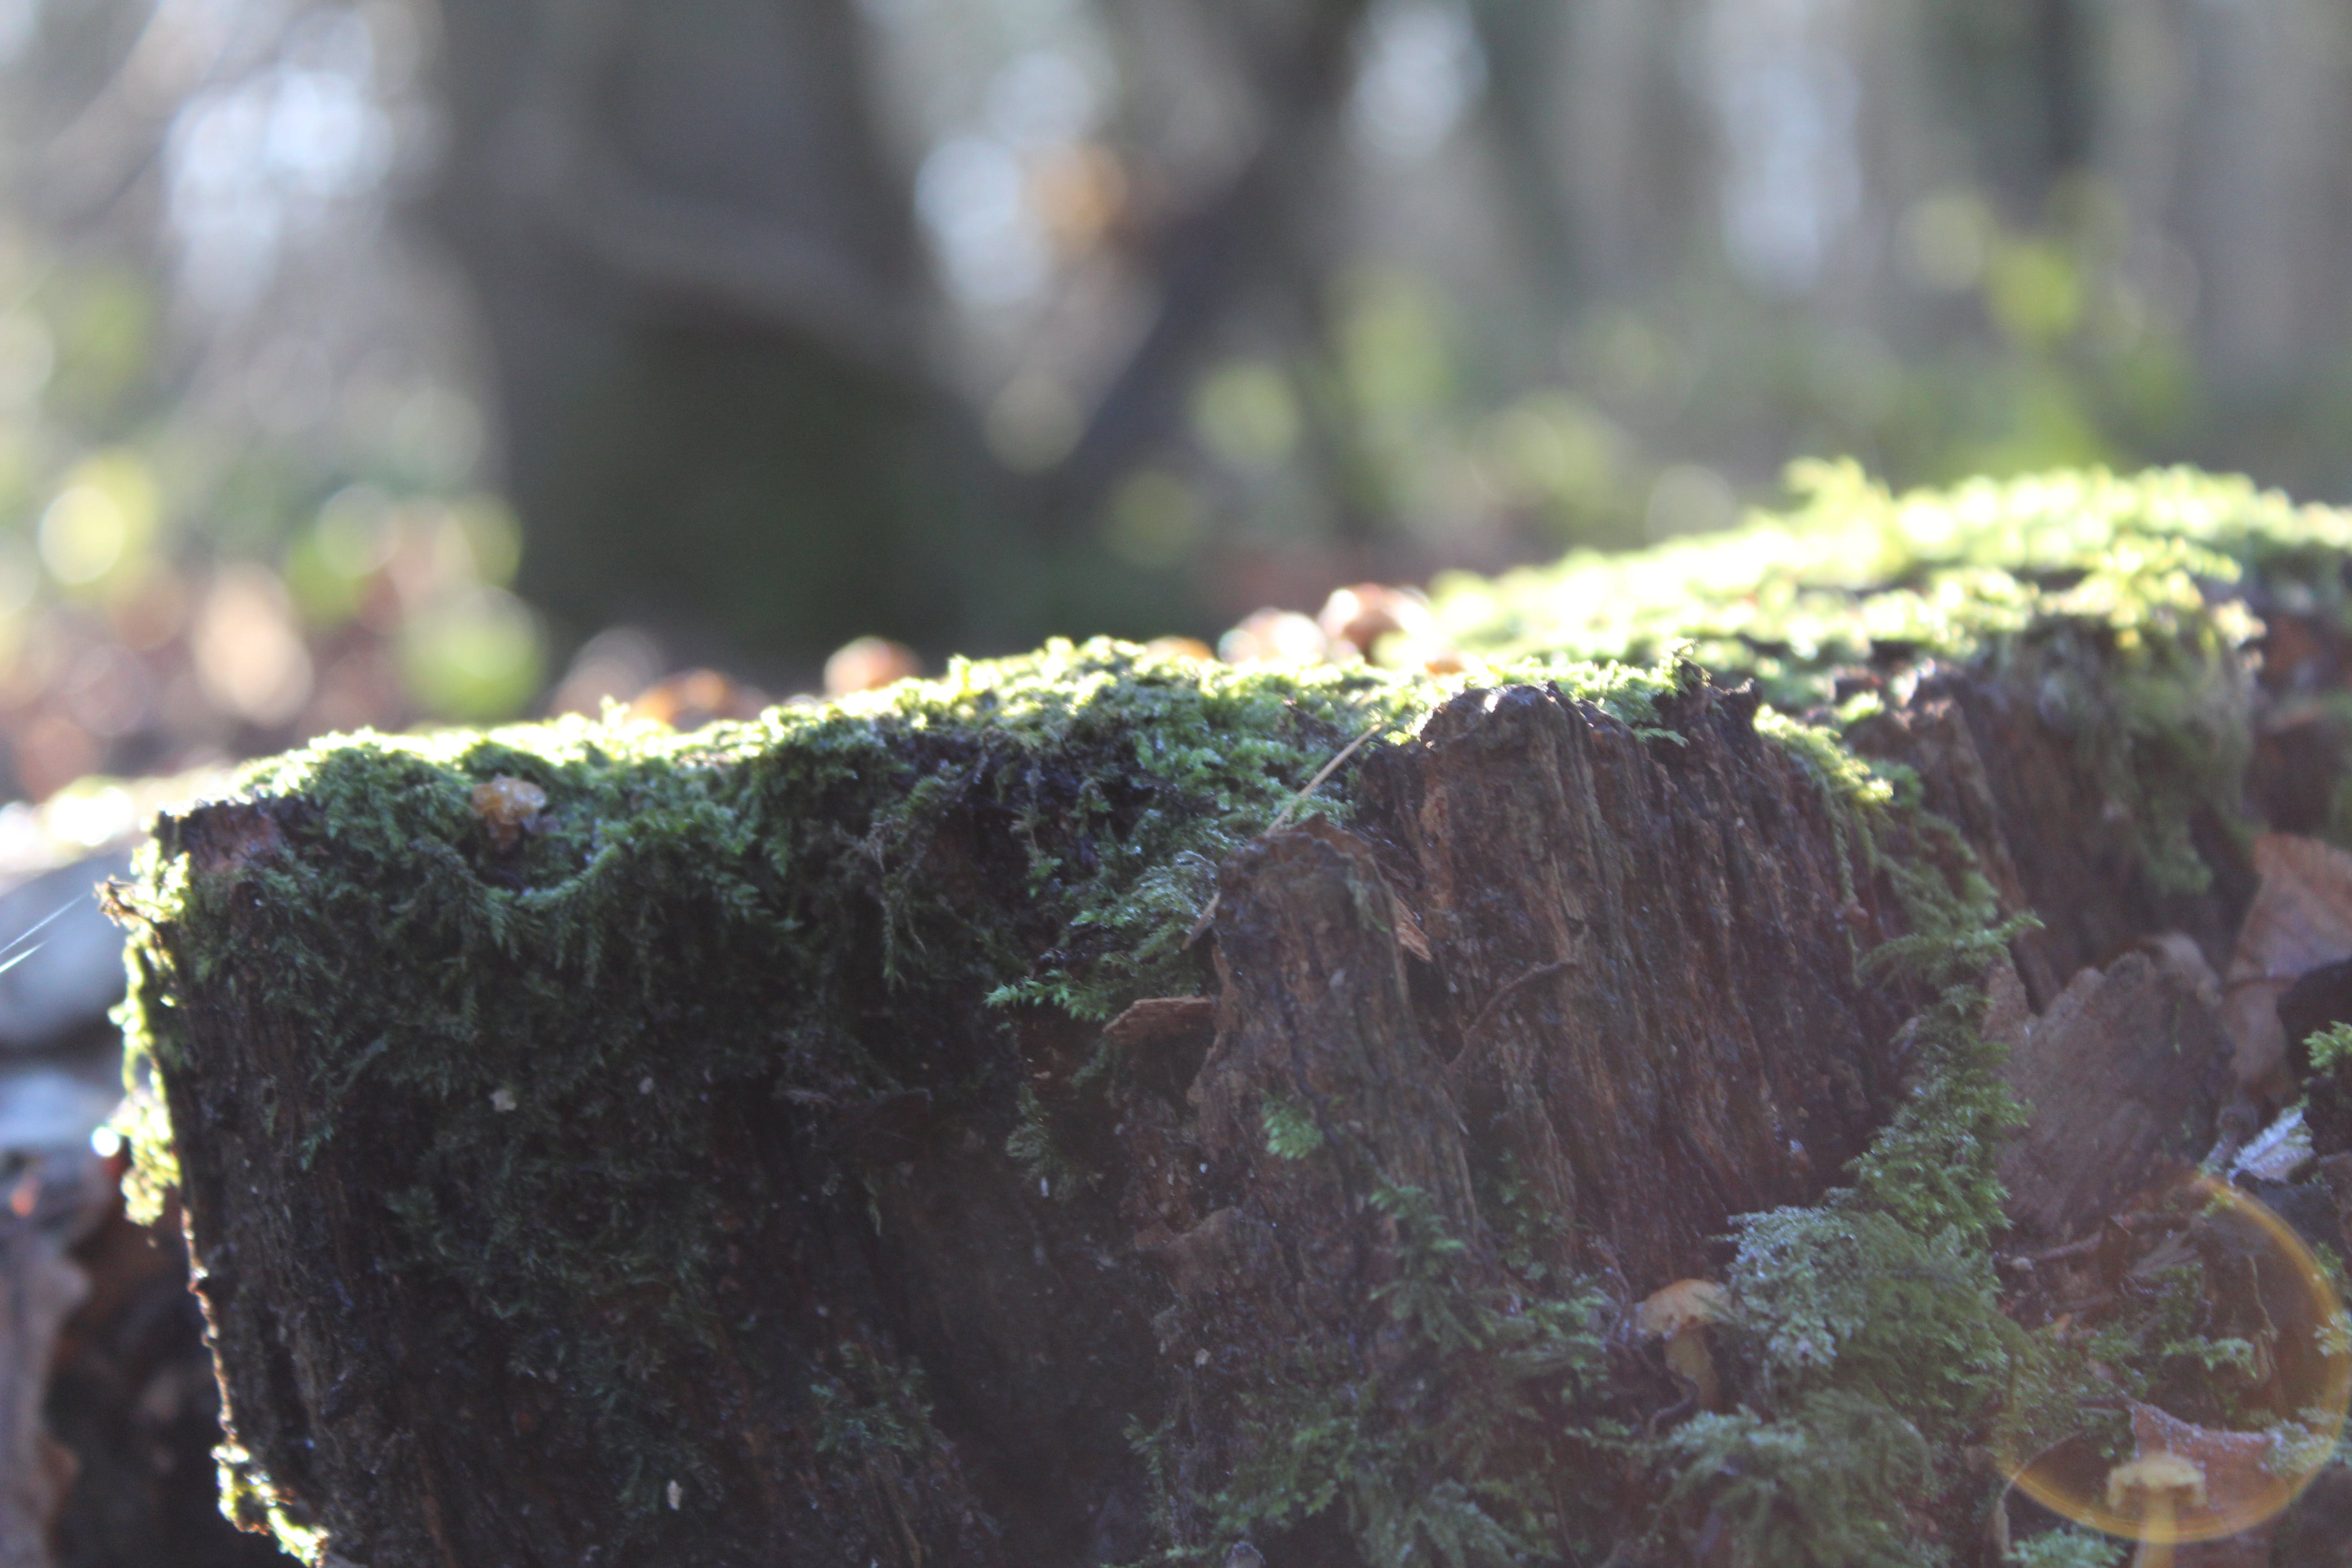 Free stock photo of moss, stump, tree, wildlife